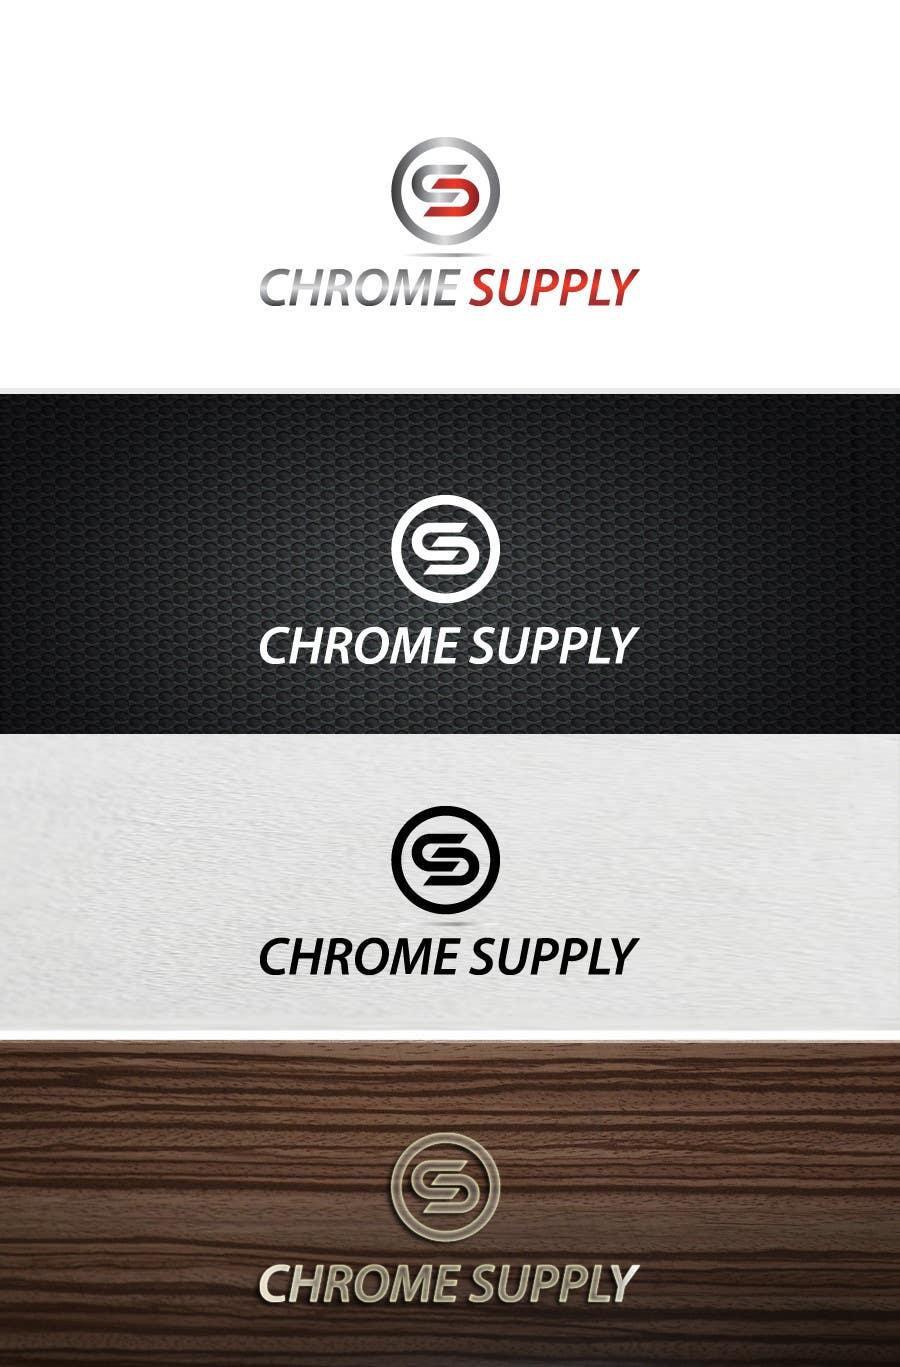 Proposition n°50 du concours Design a Logo for Chrome Supply